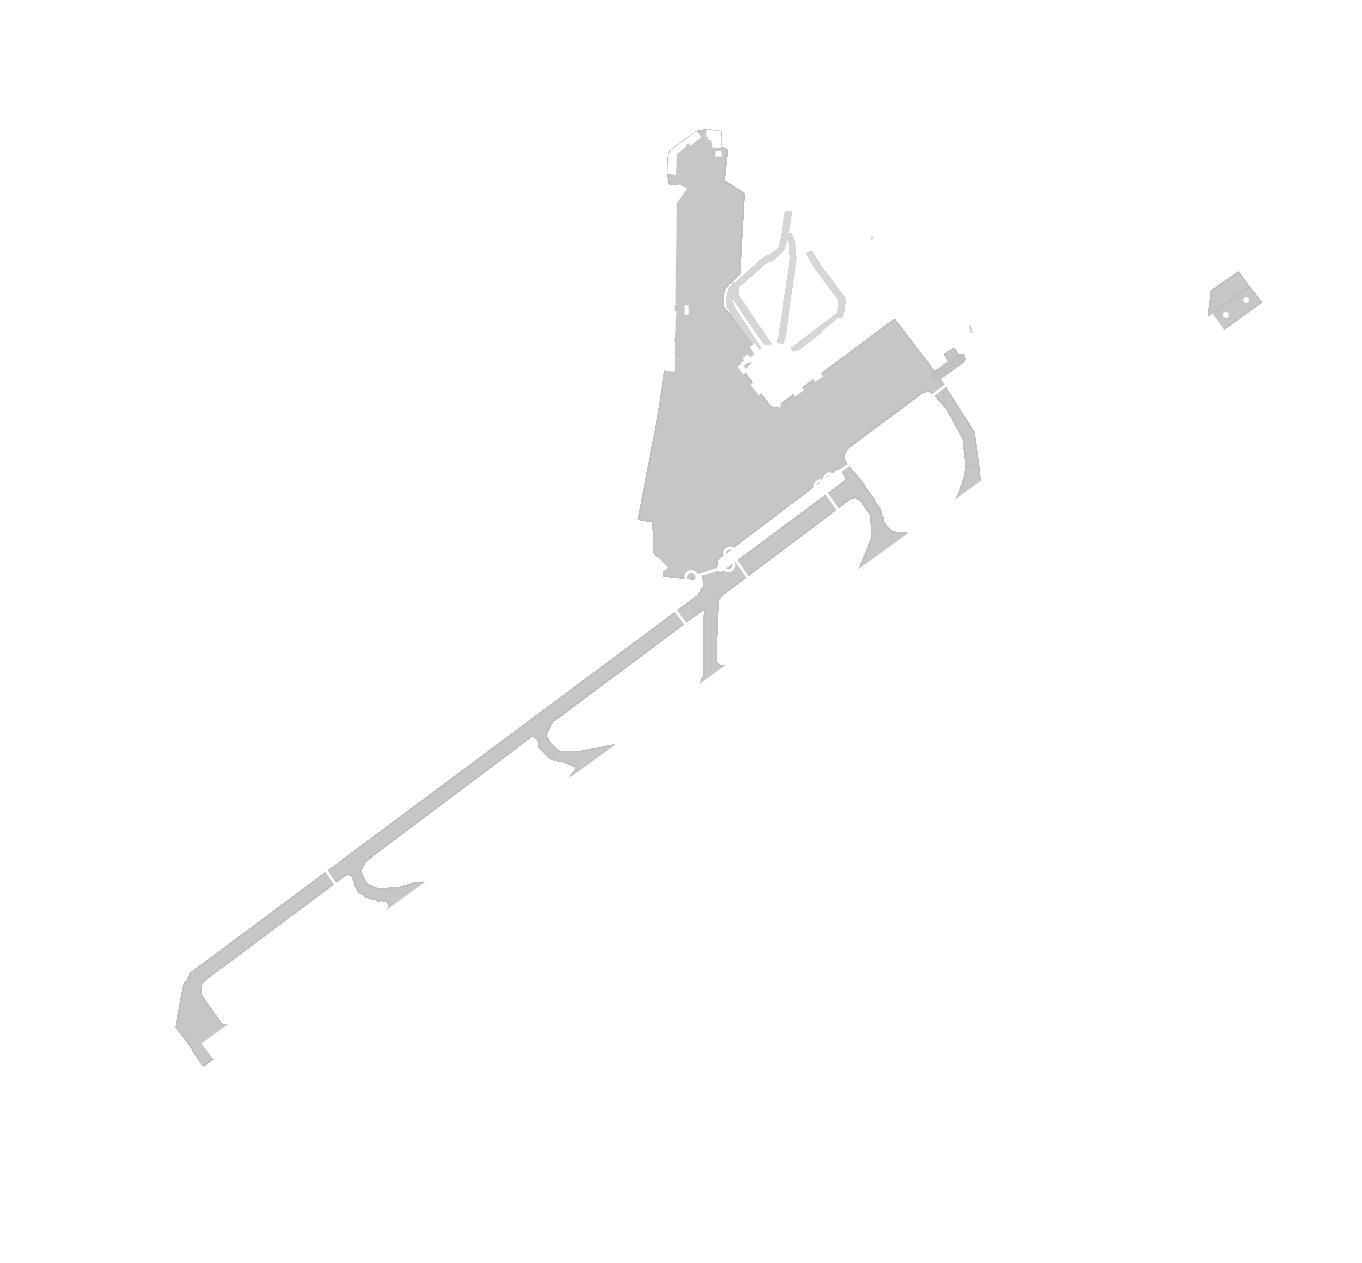 mappa genova